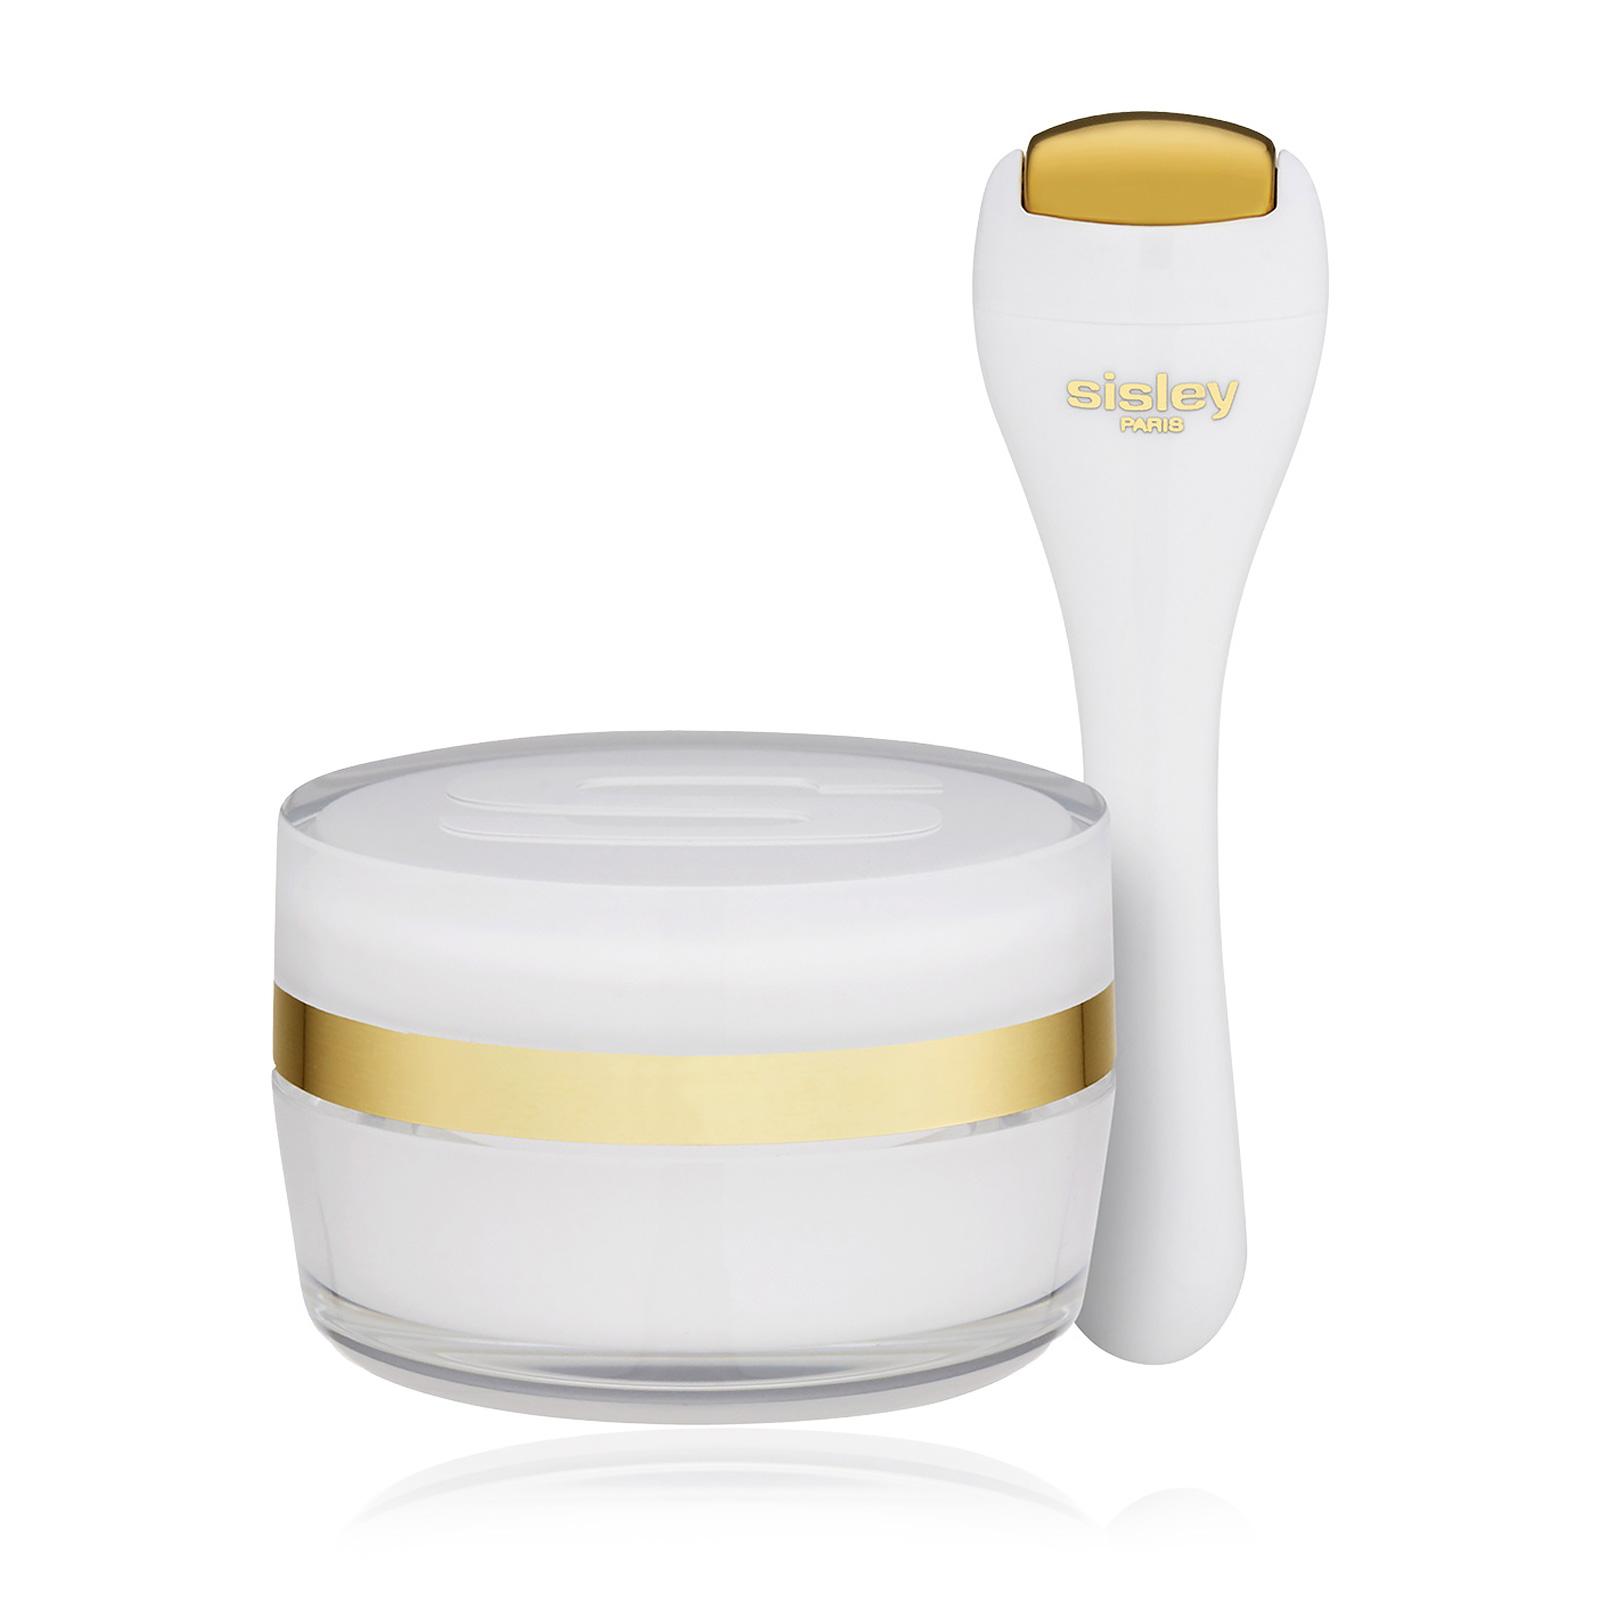 Sisleya L'Integral Anti-Age Eye & Lip Contour Cream (Limited Edition with Massage Tool)